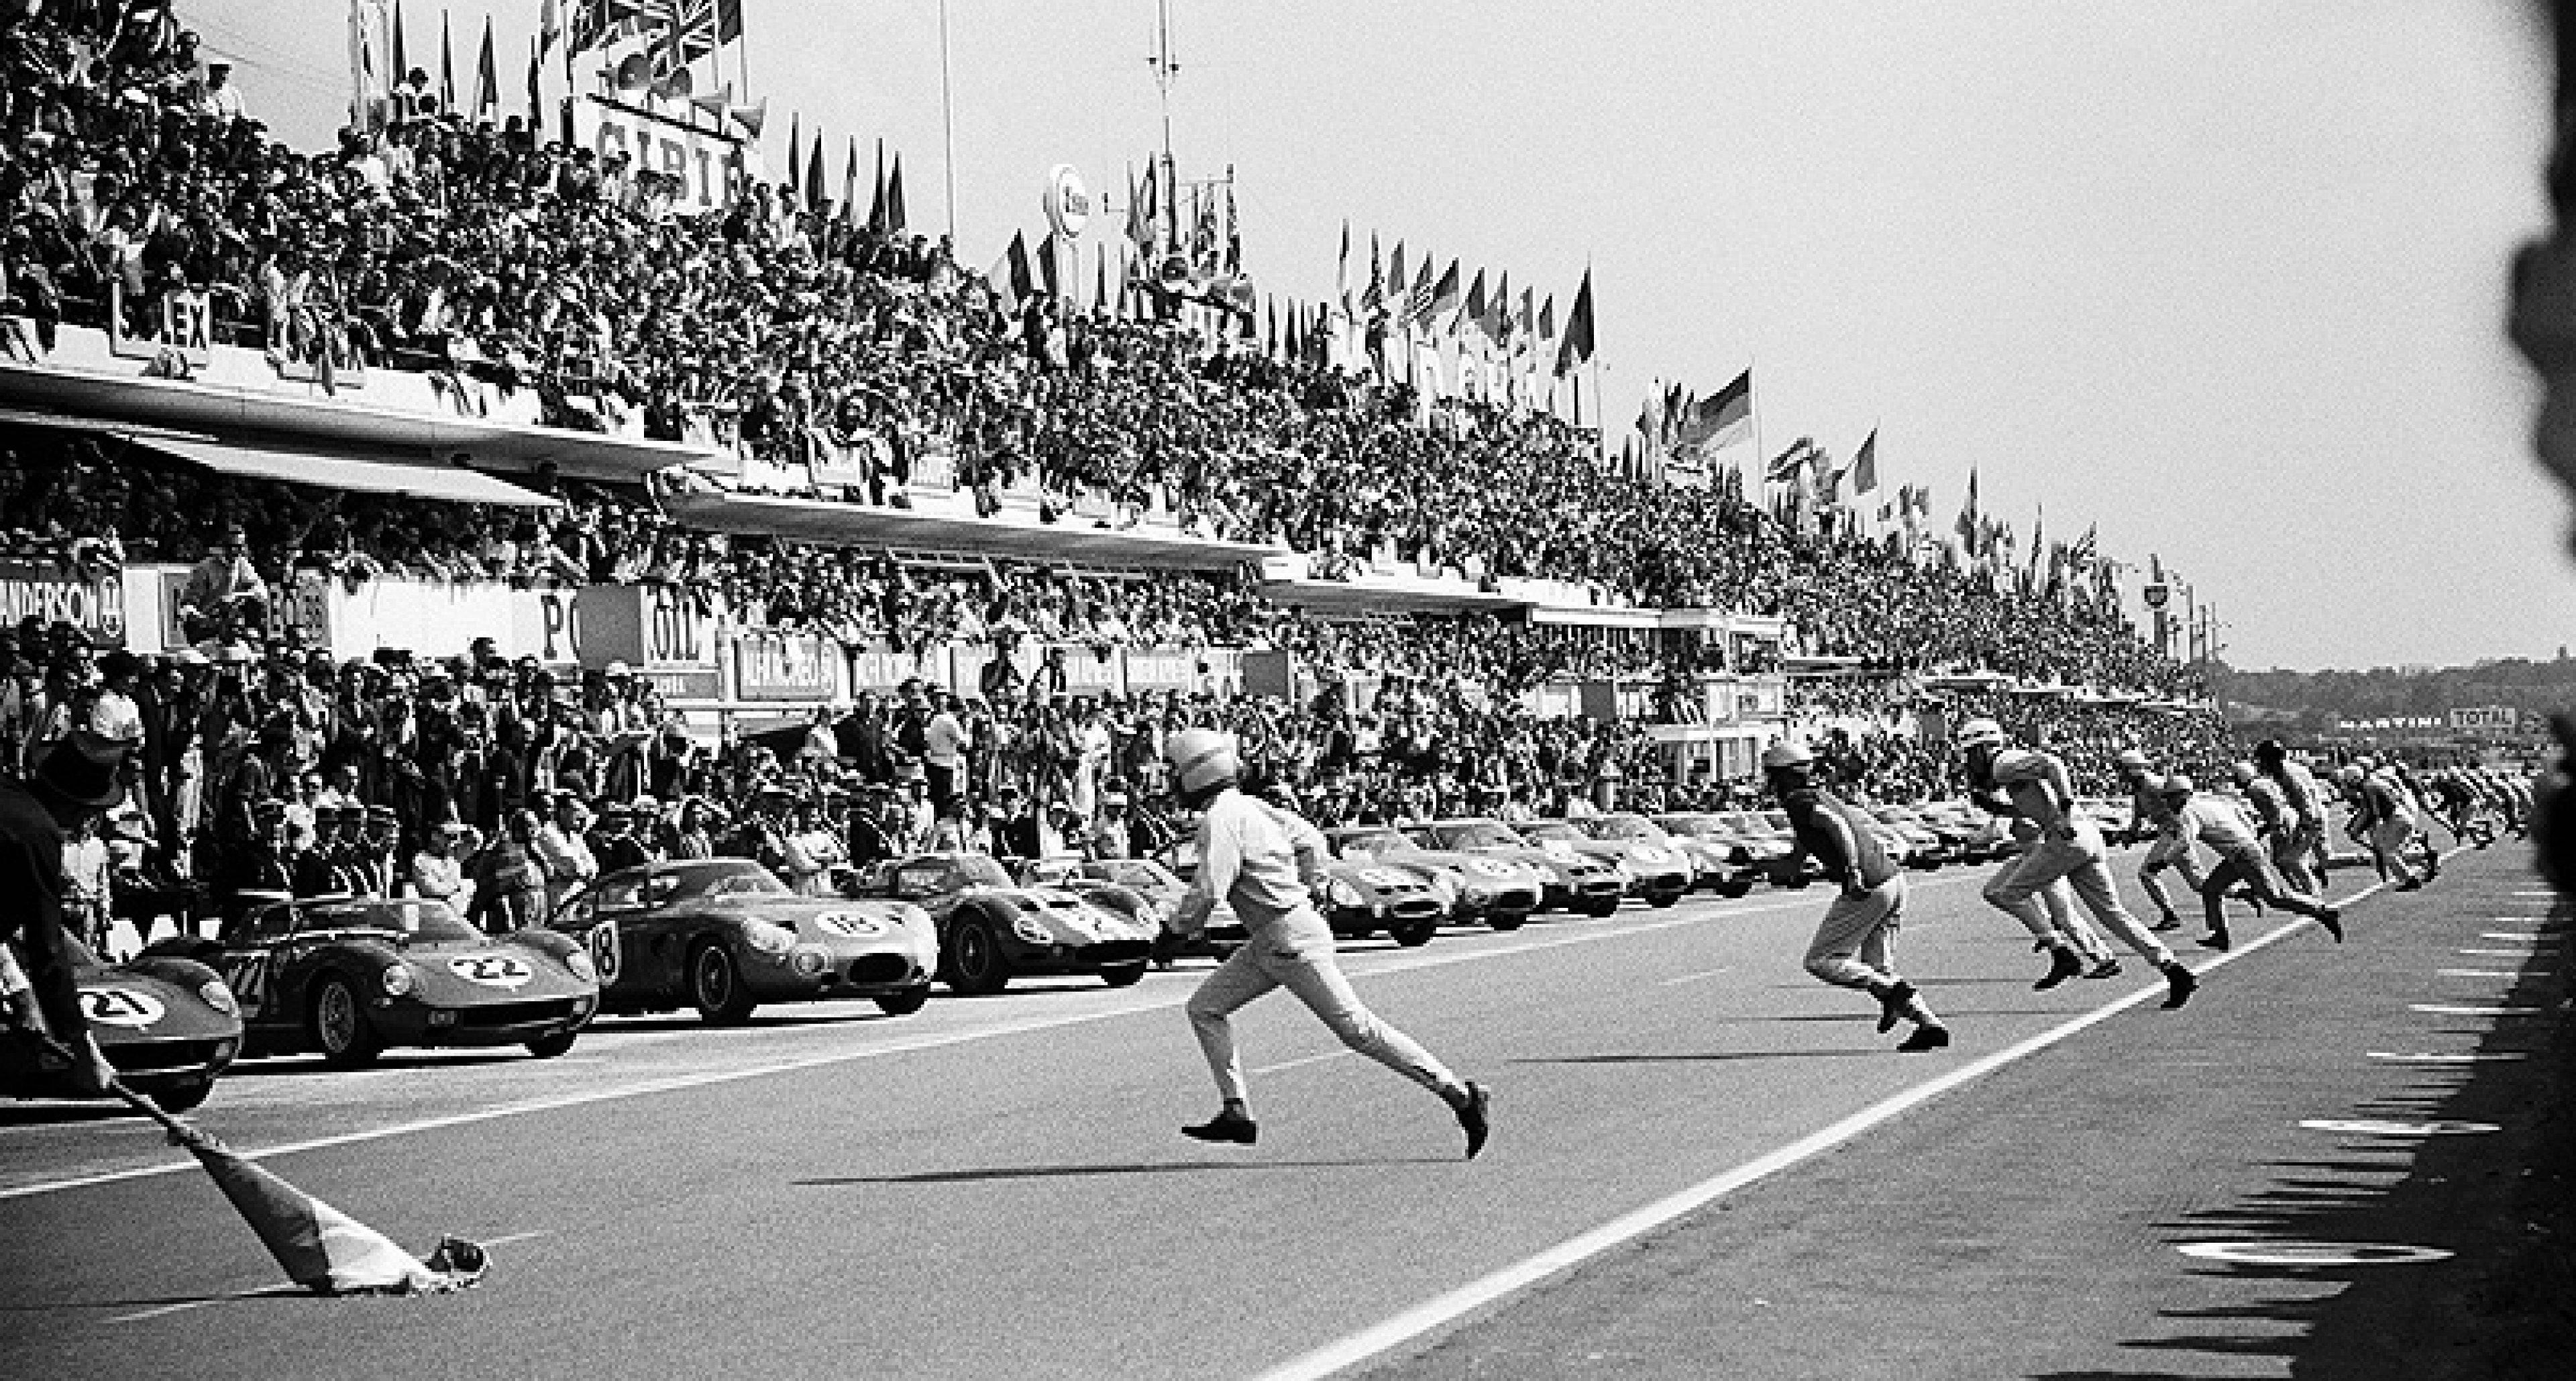 Le Mans im Fokus: Beeindruckende Fotografien bei Prototyp